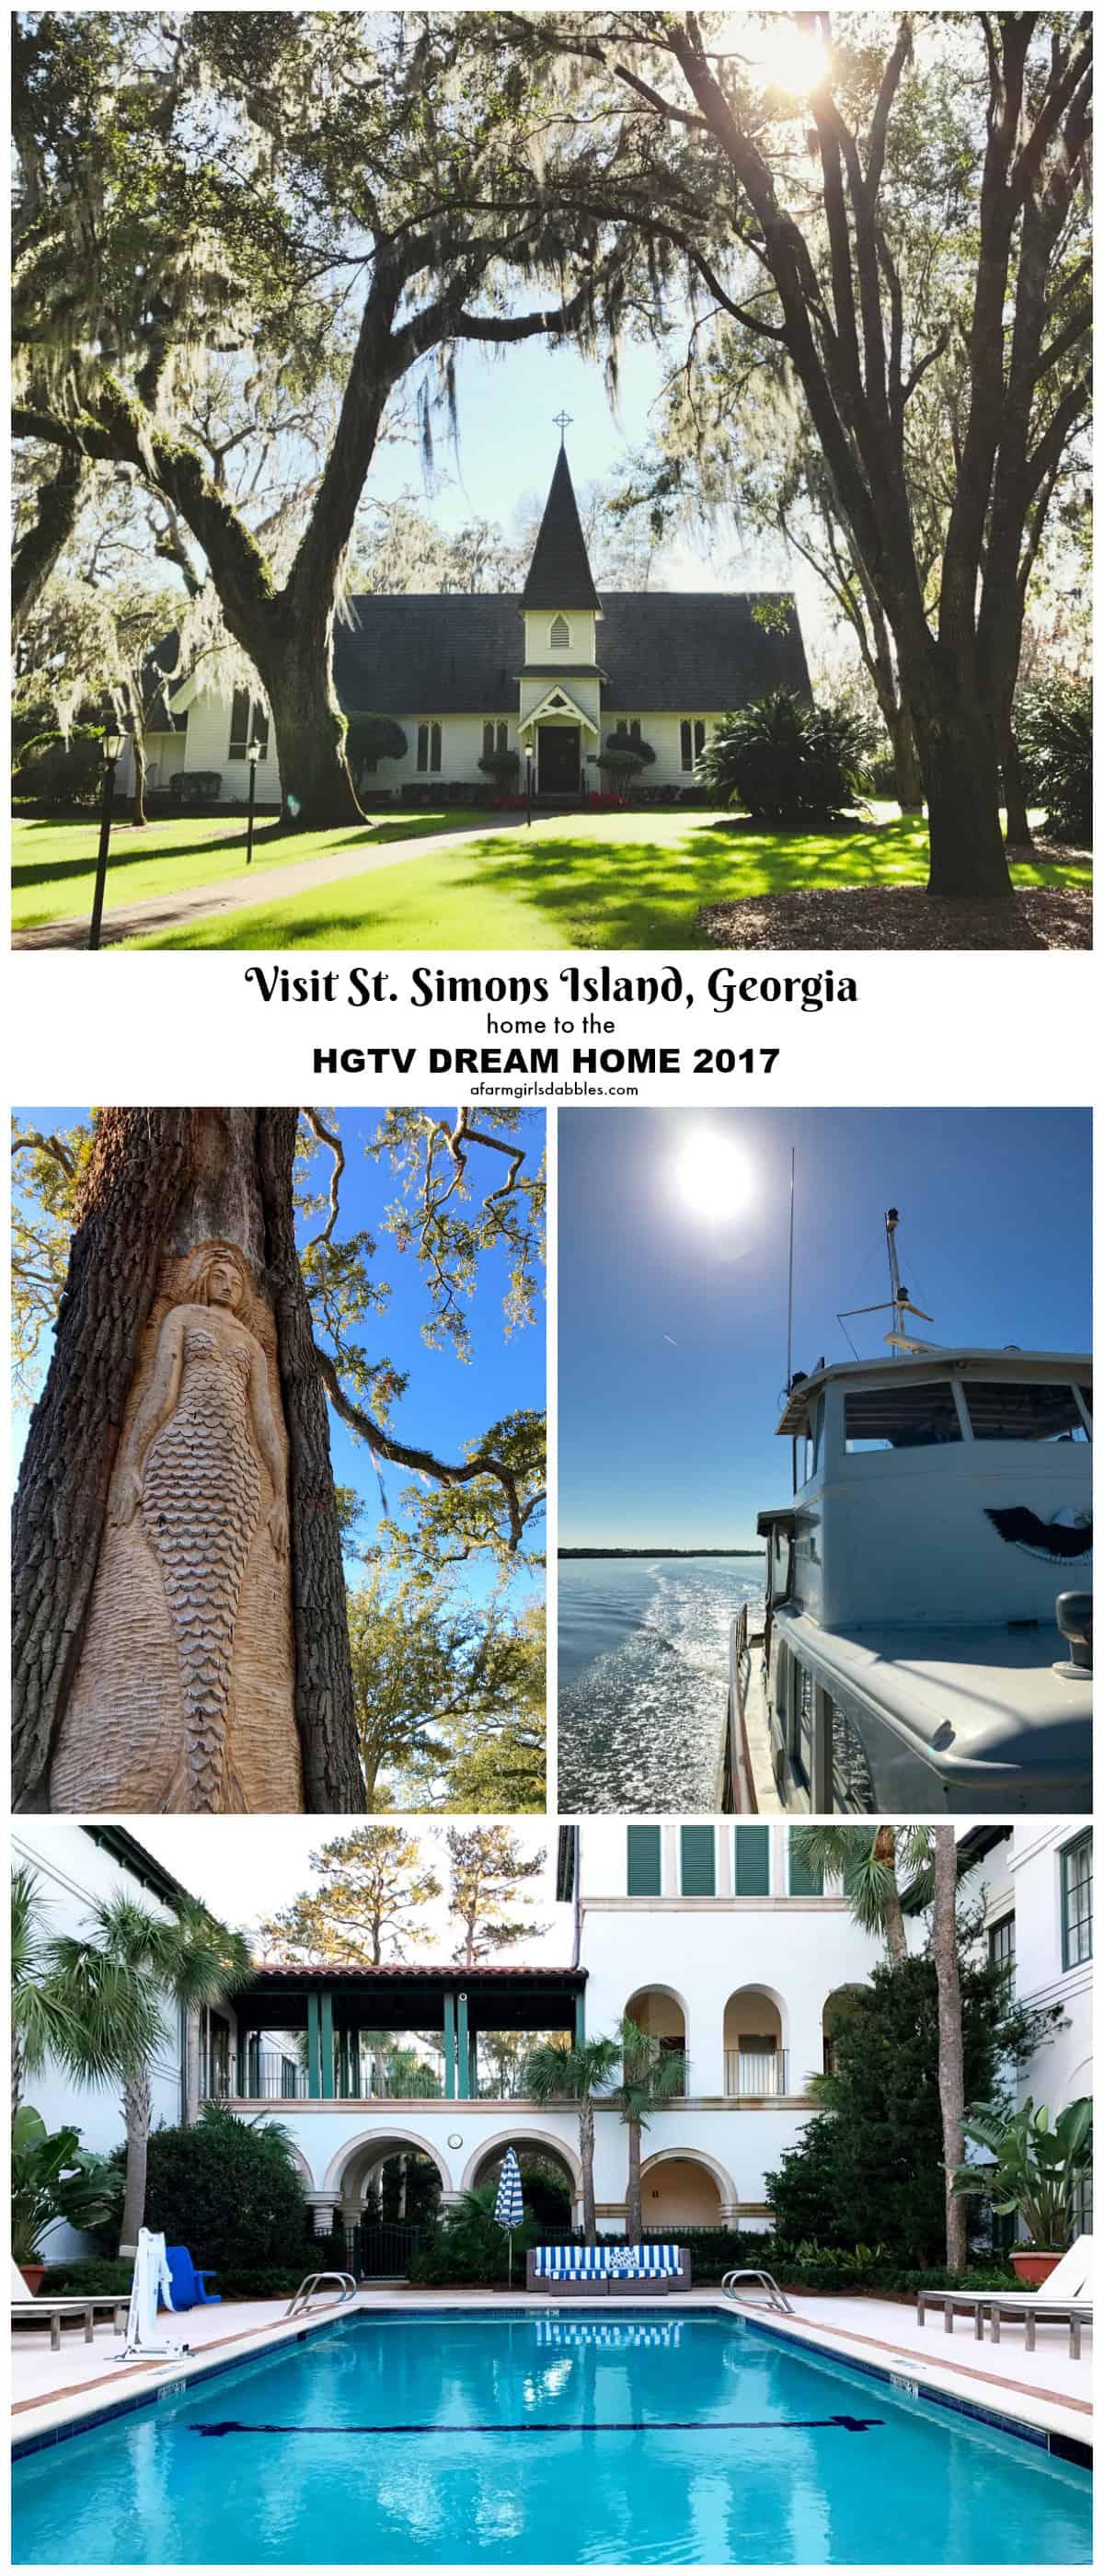 pinterest image of Visit St. Simons Island, Georgia